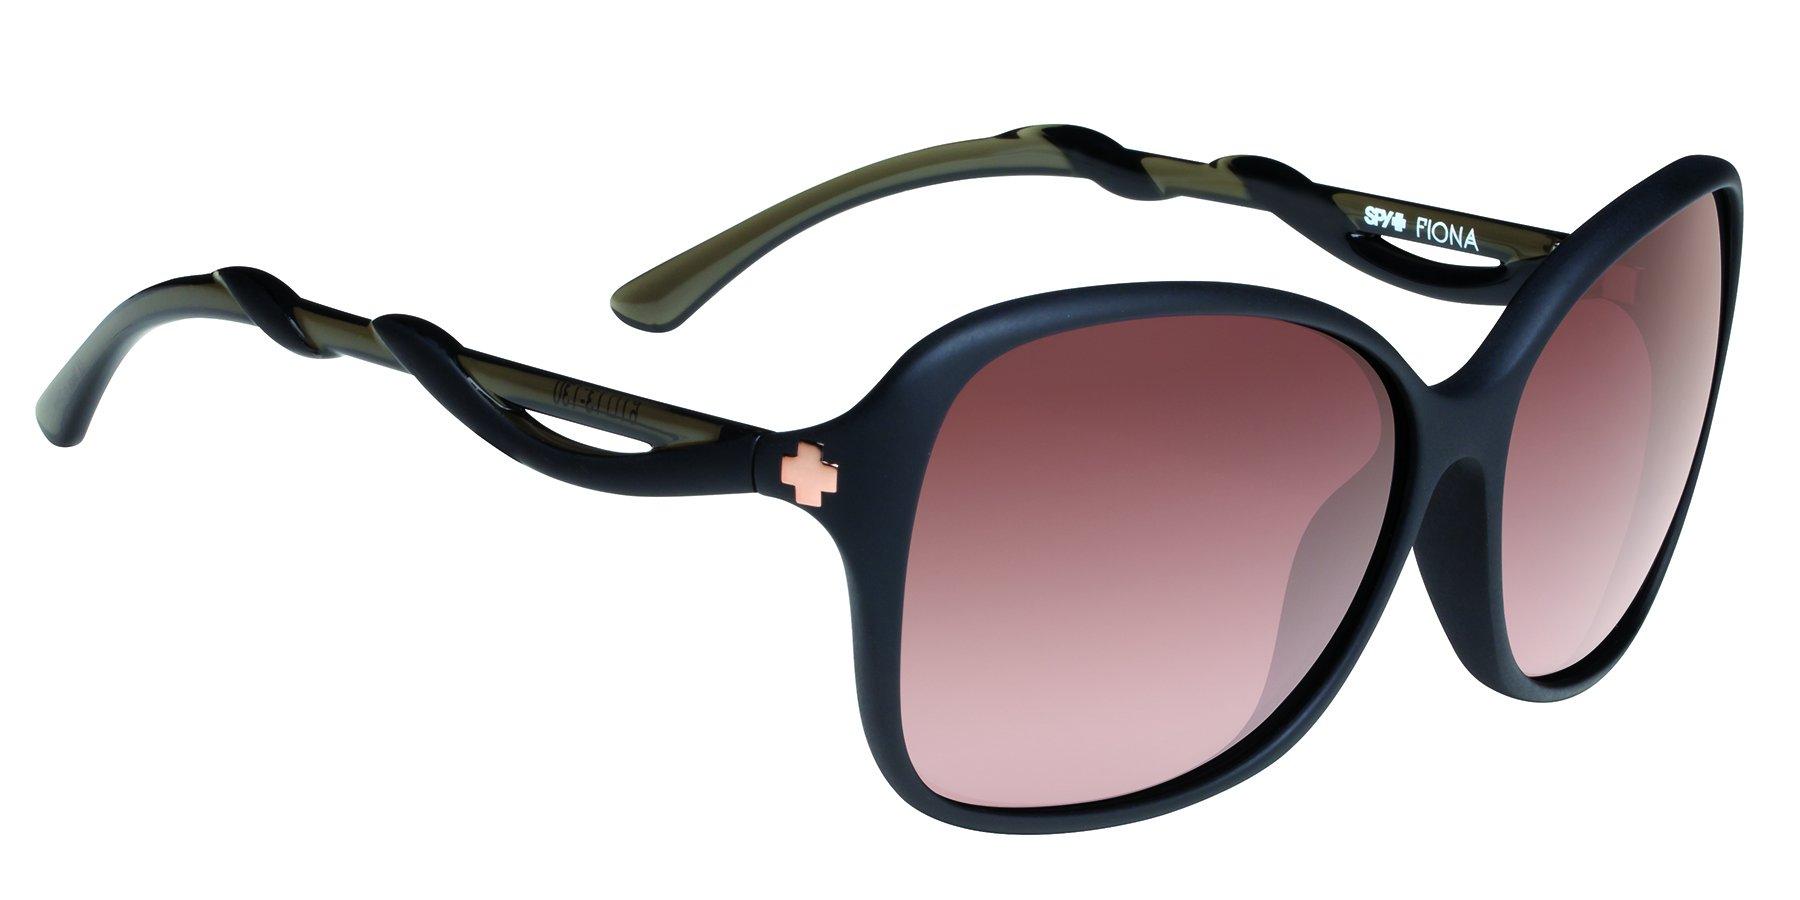 Spy Fiona Sunglasses, Femme Fatale/Happy Bronze Fade, 61 mm